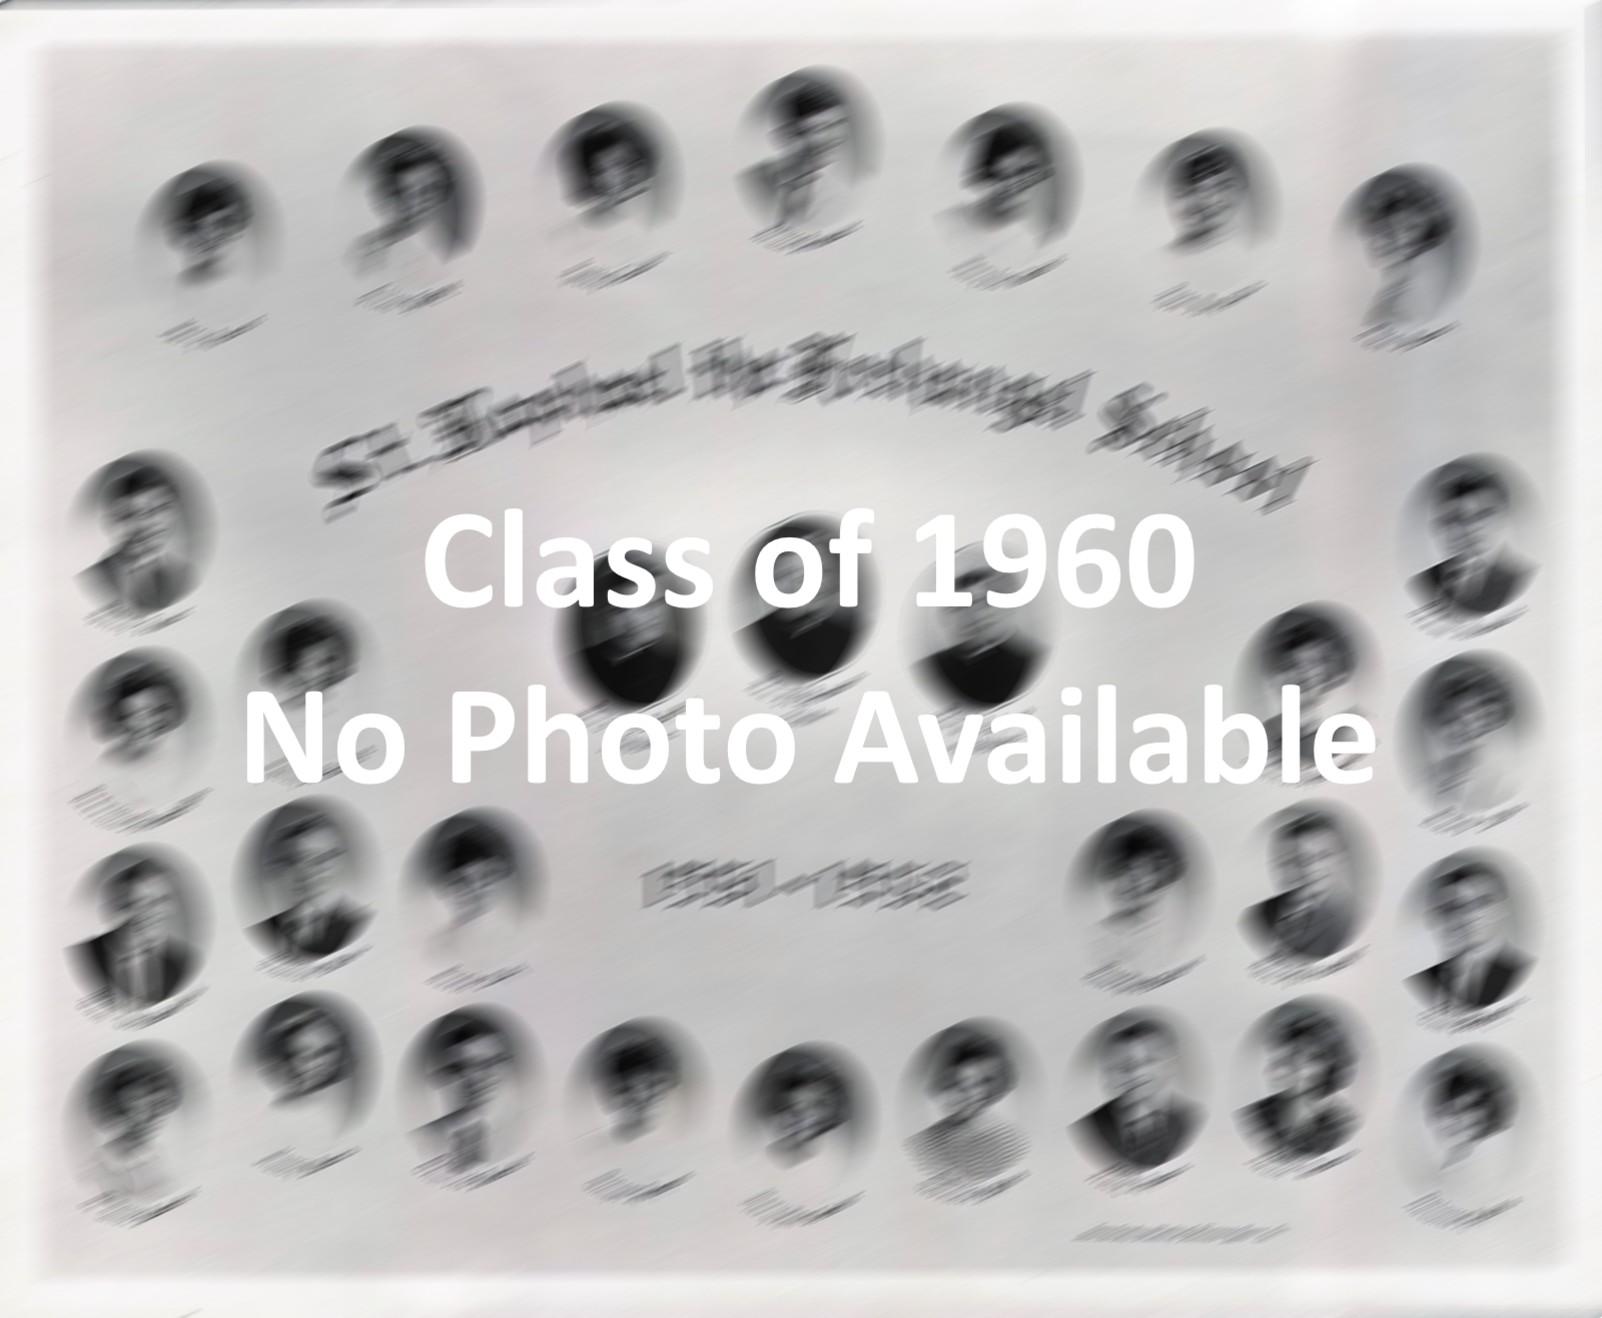 Graduation Class of 1960